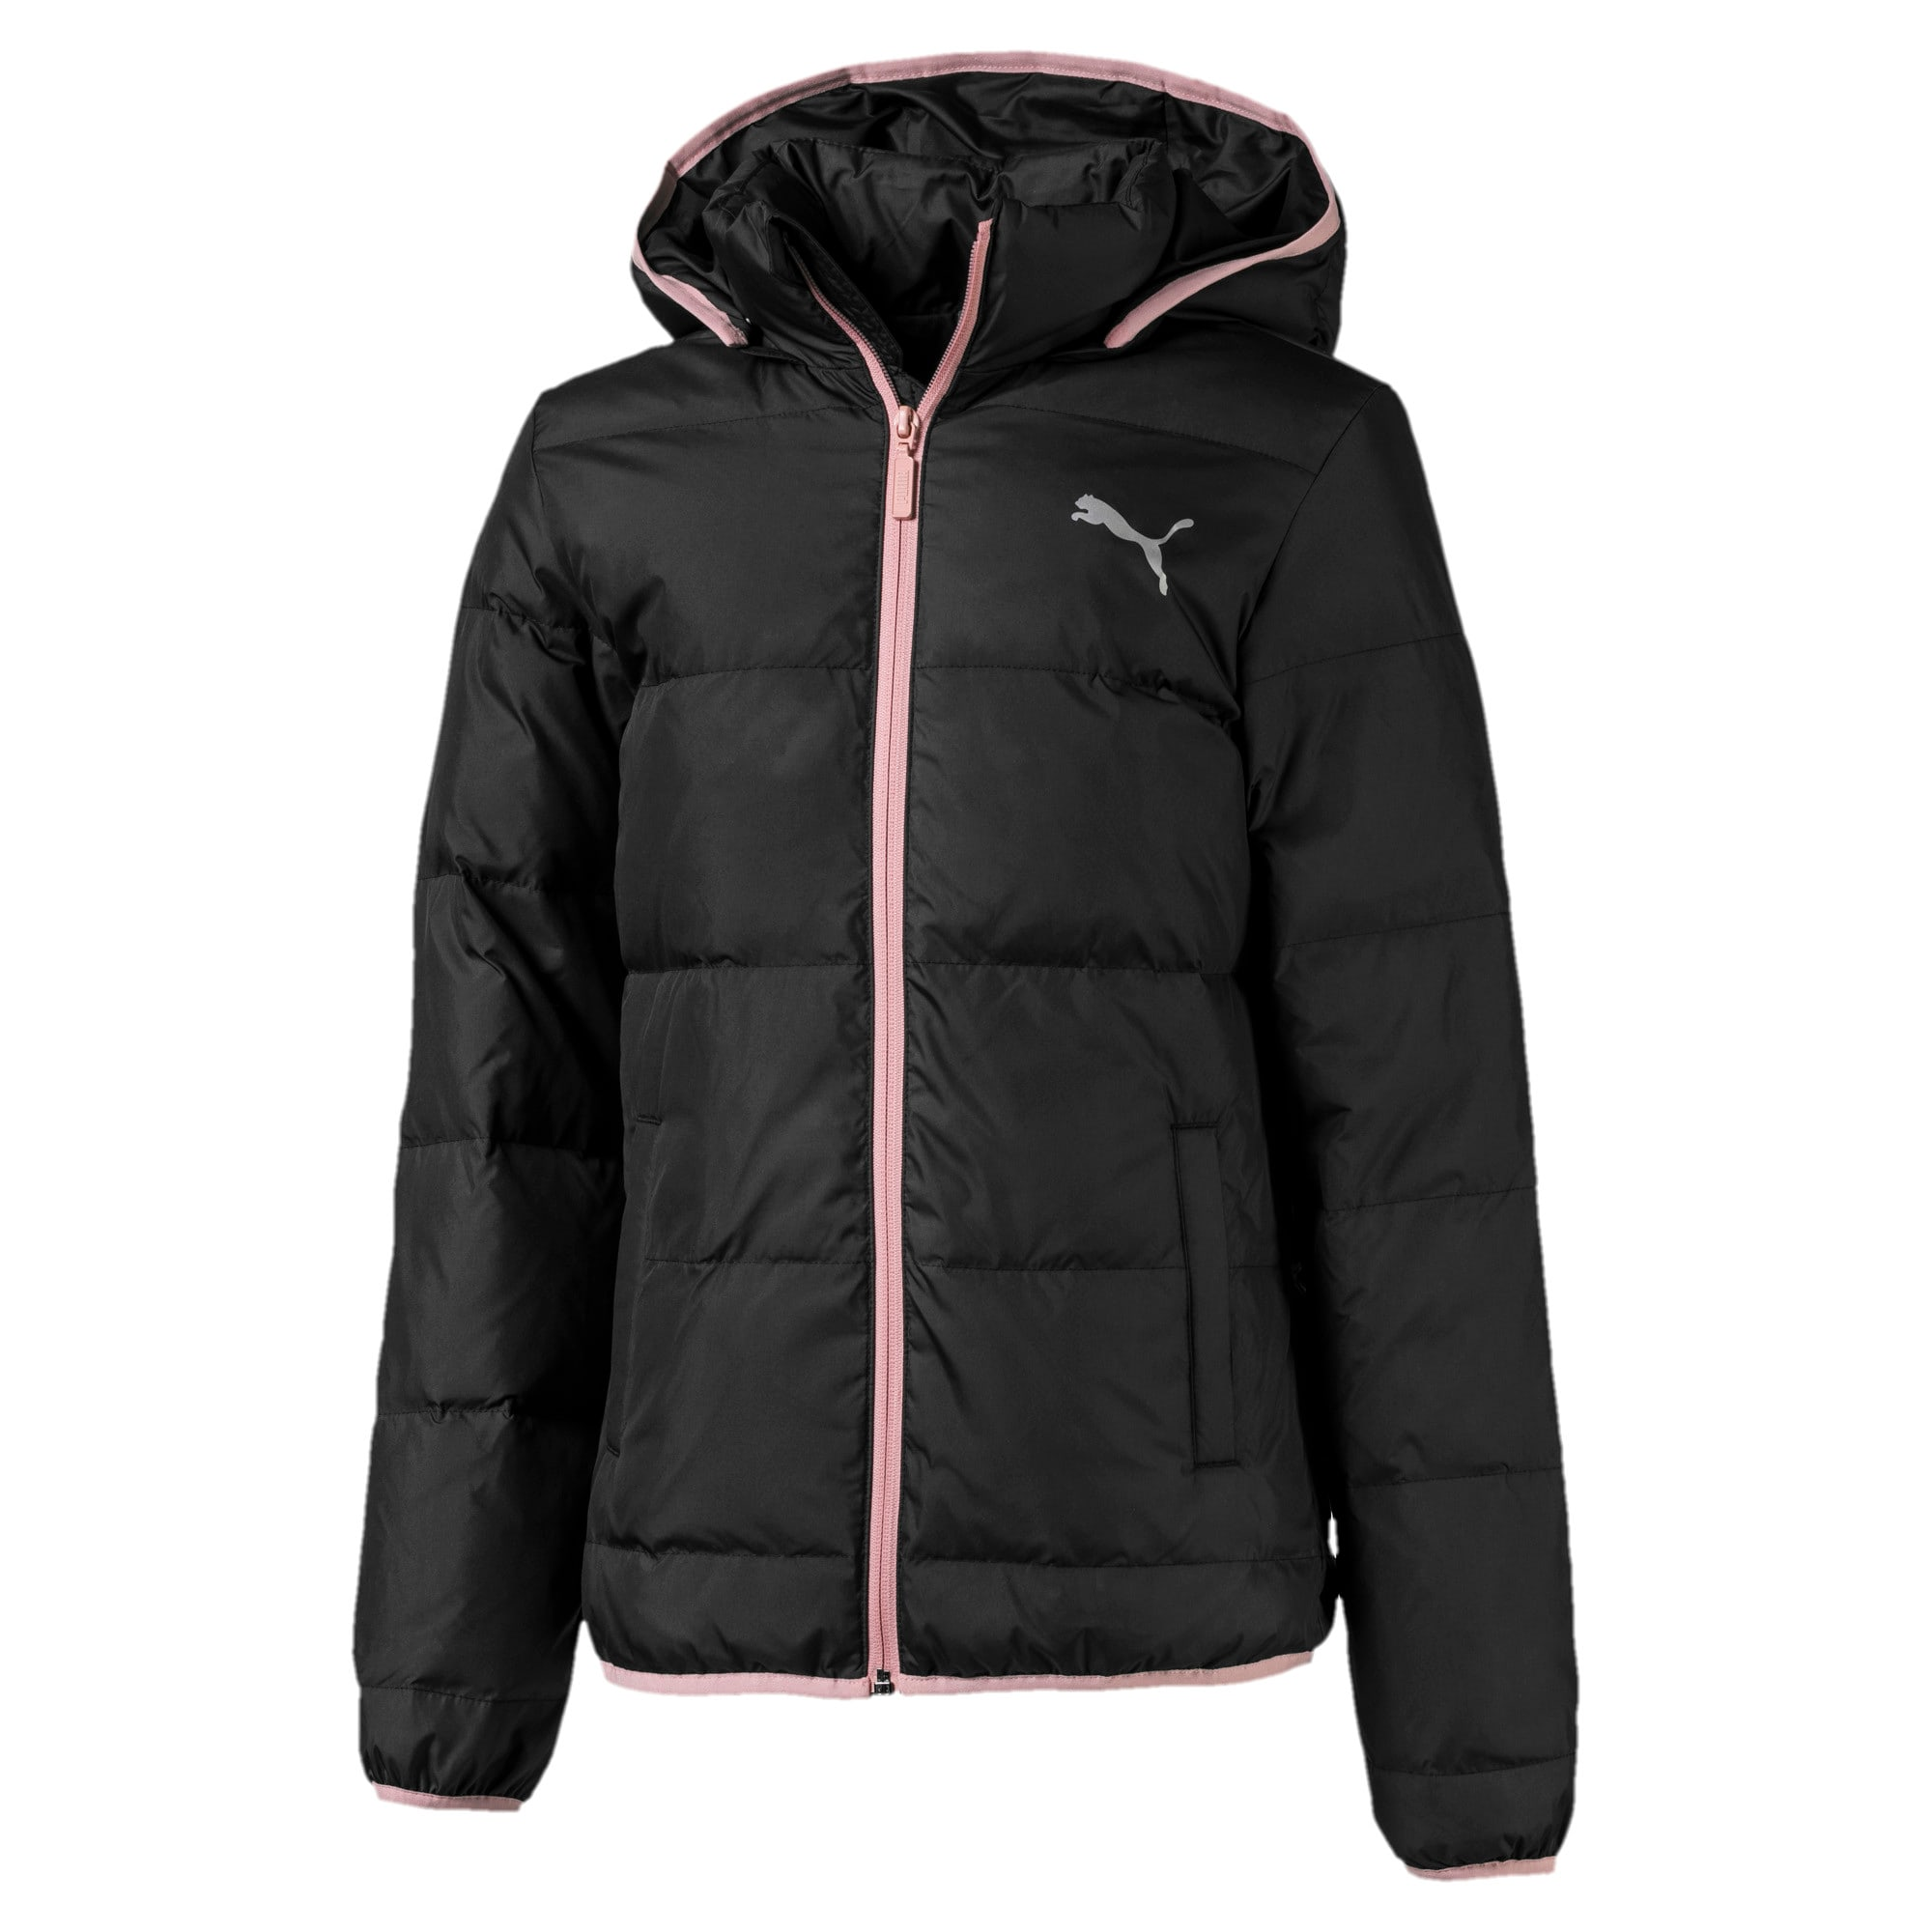 Thumbnail 1 of Light Down Girls' Jacket, Puma Black, medium